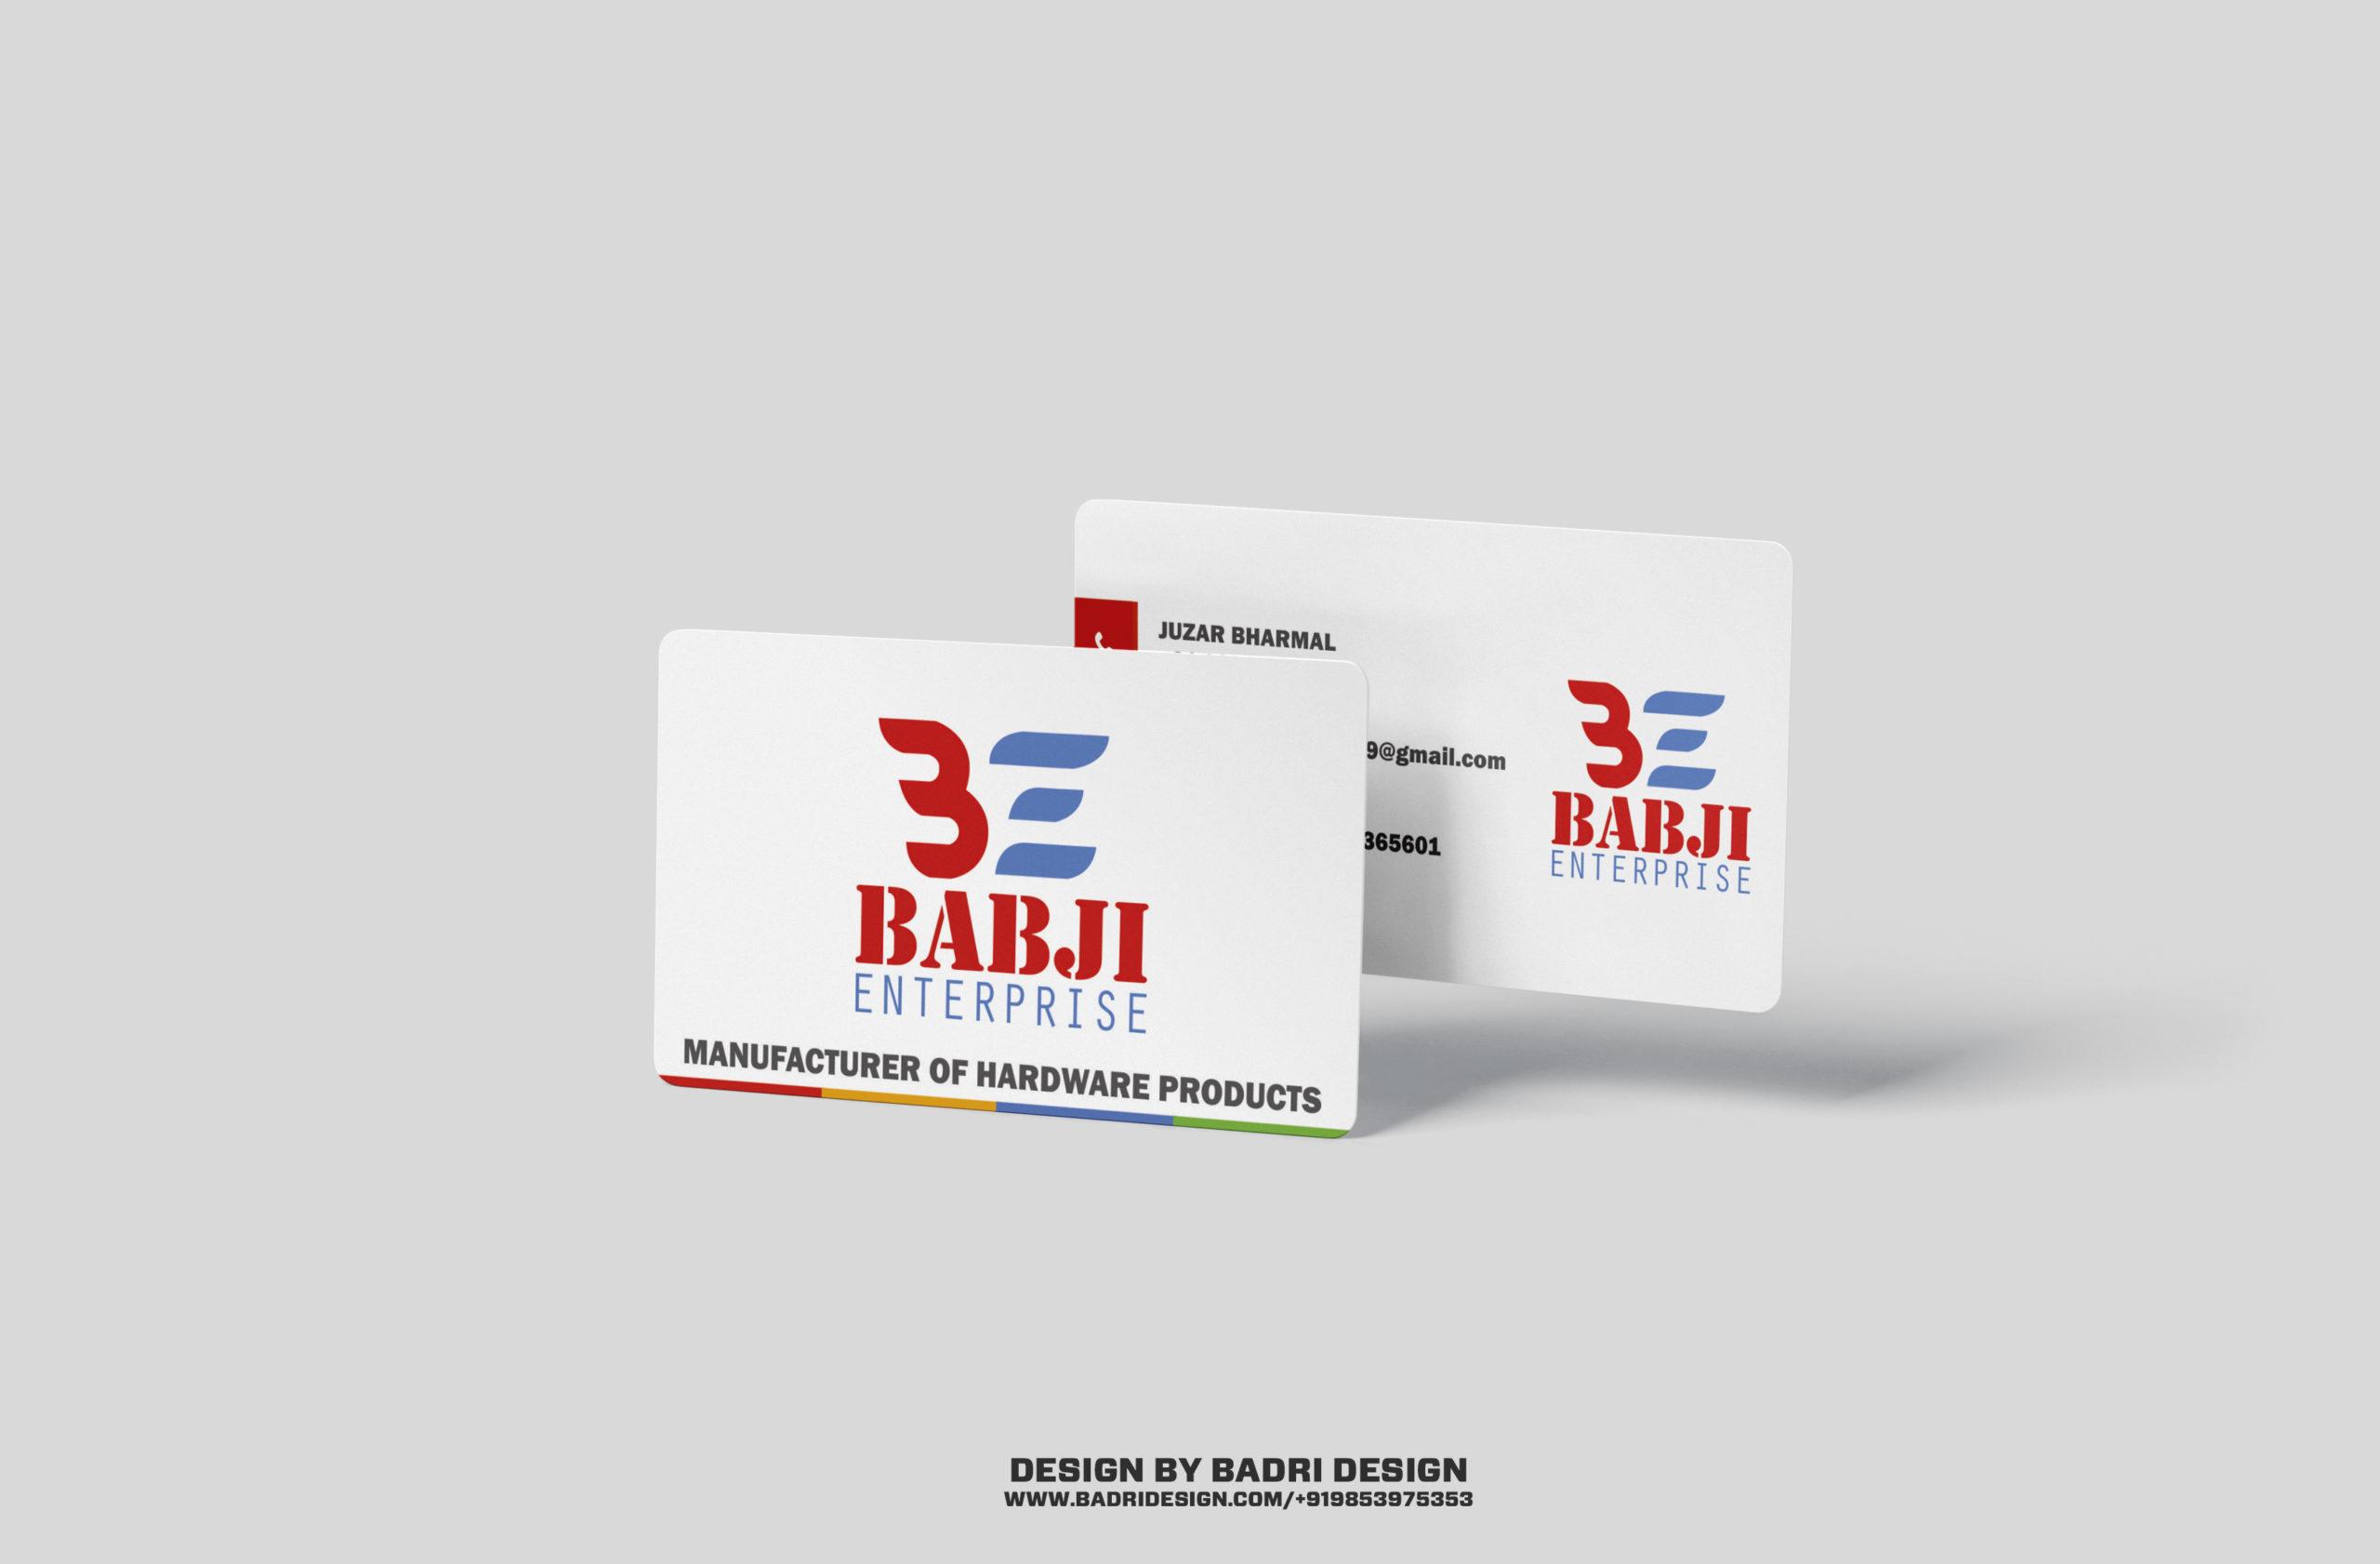 Babji Enterprise manufacturing company business card design by Badri Design